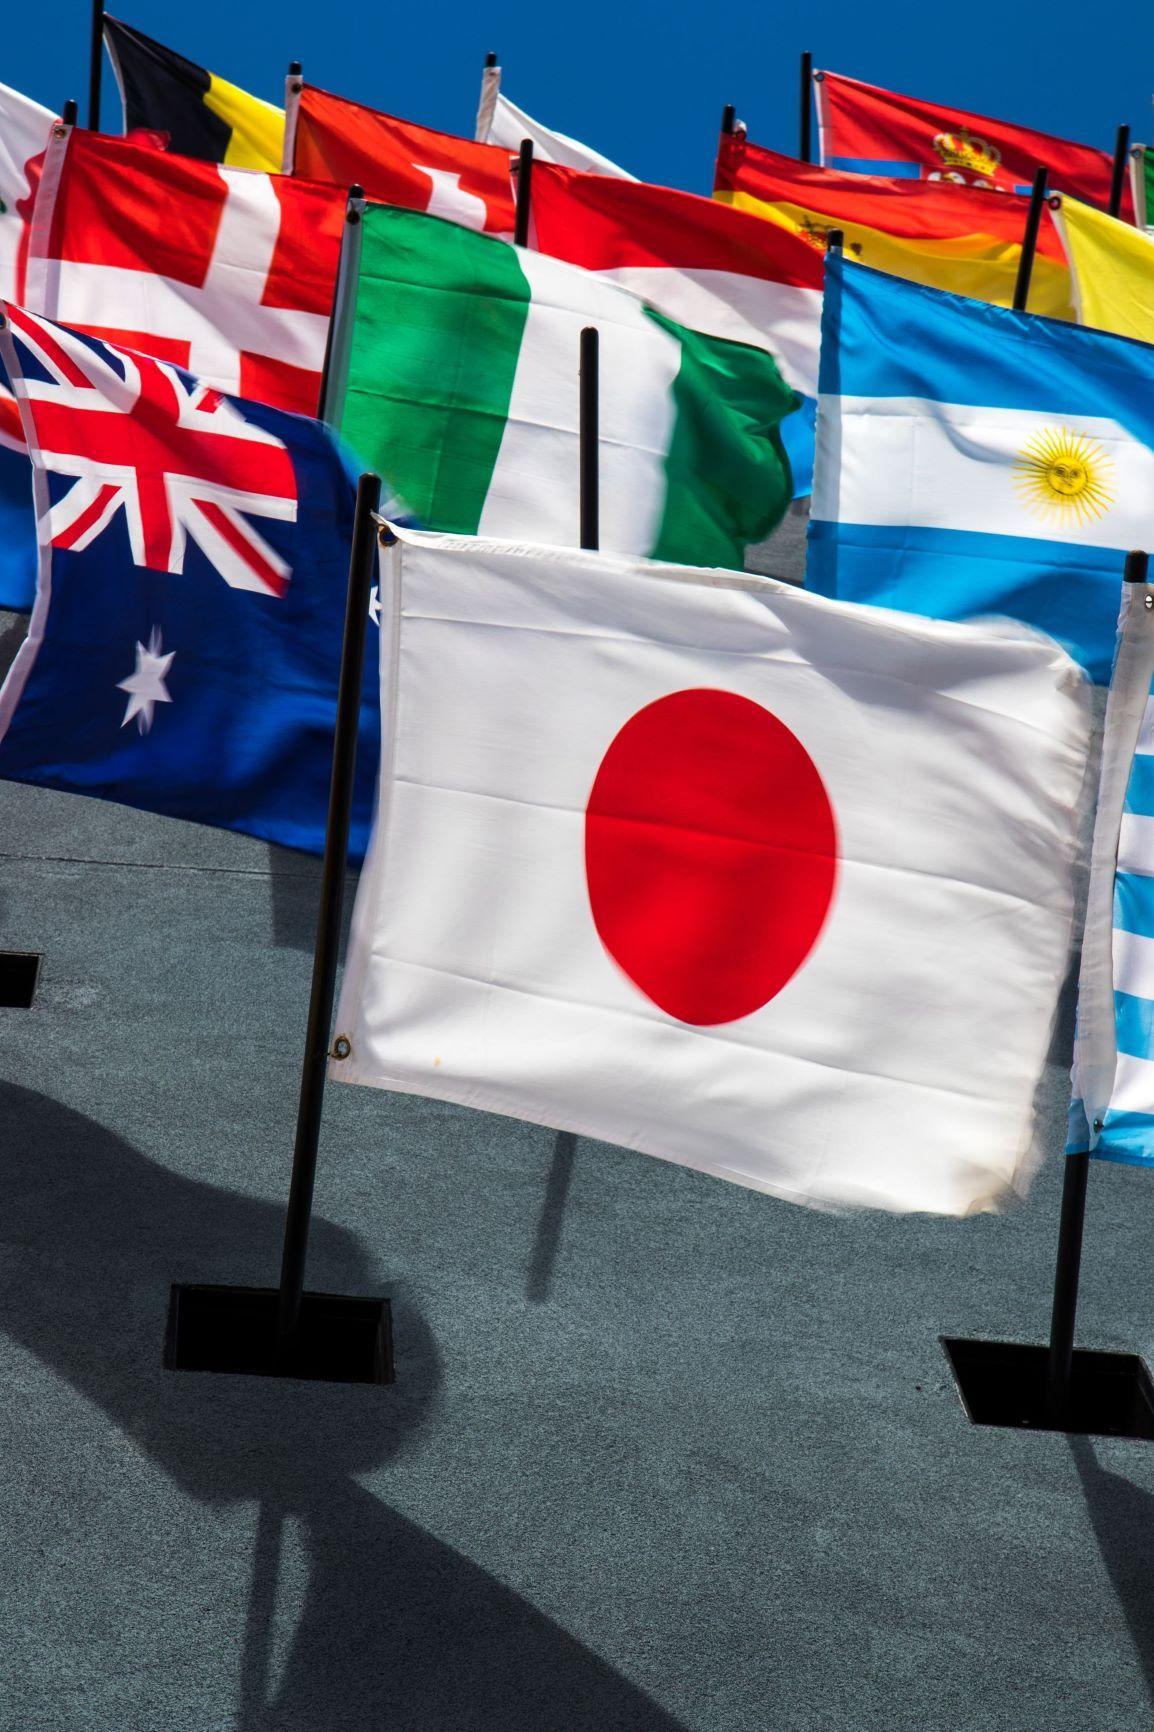 Japan's Central Bank Calls for International Cooperation on Regulating Libra